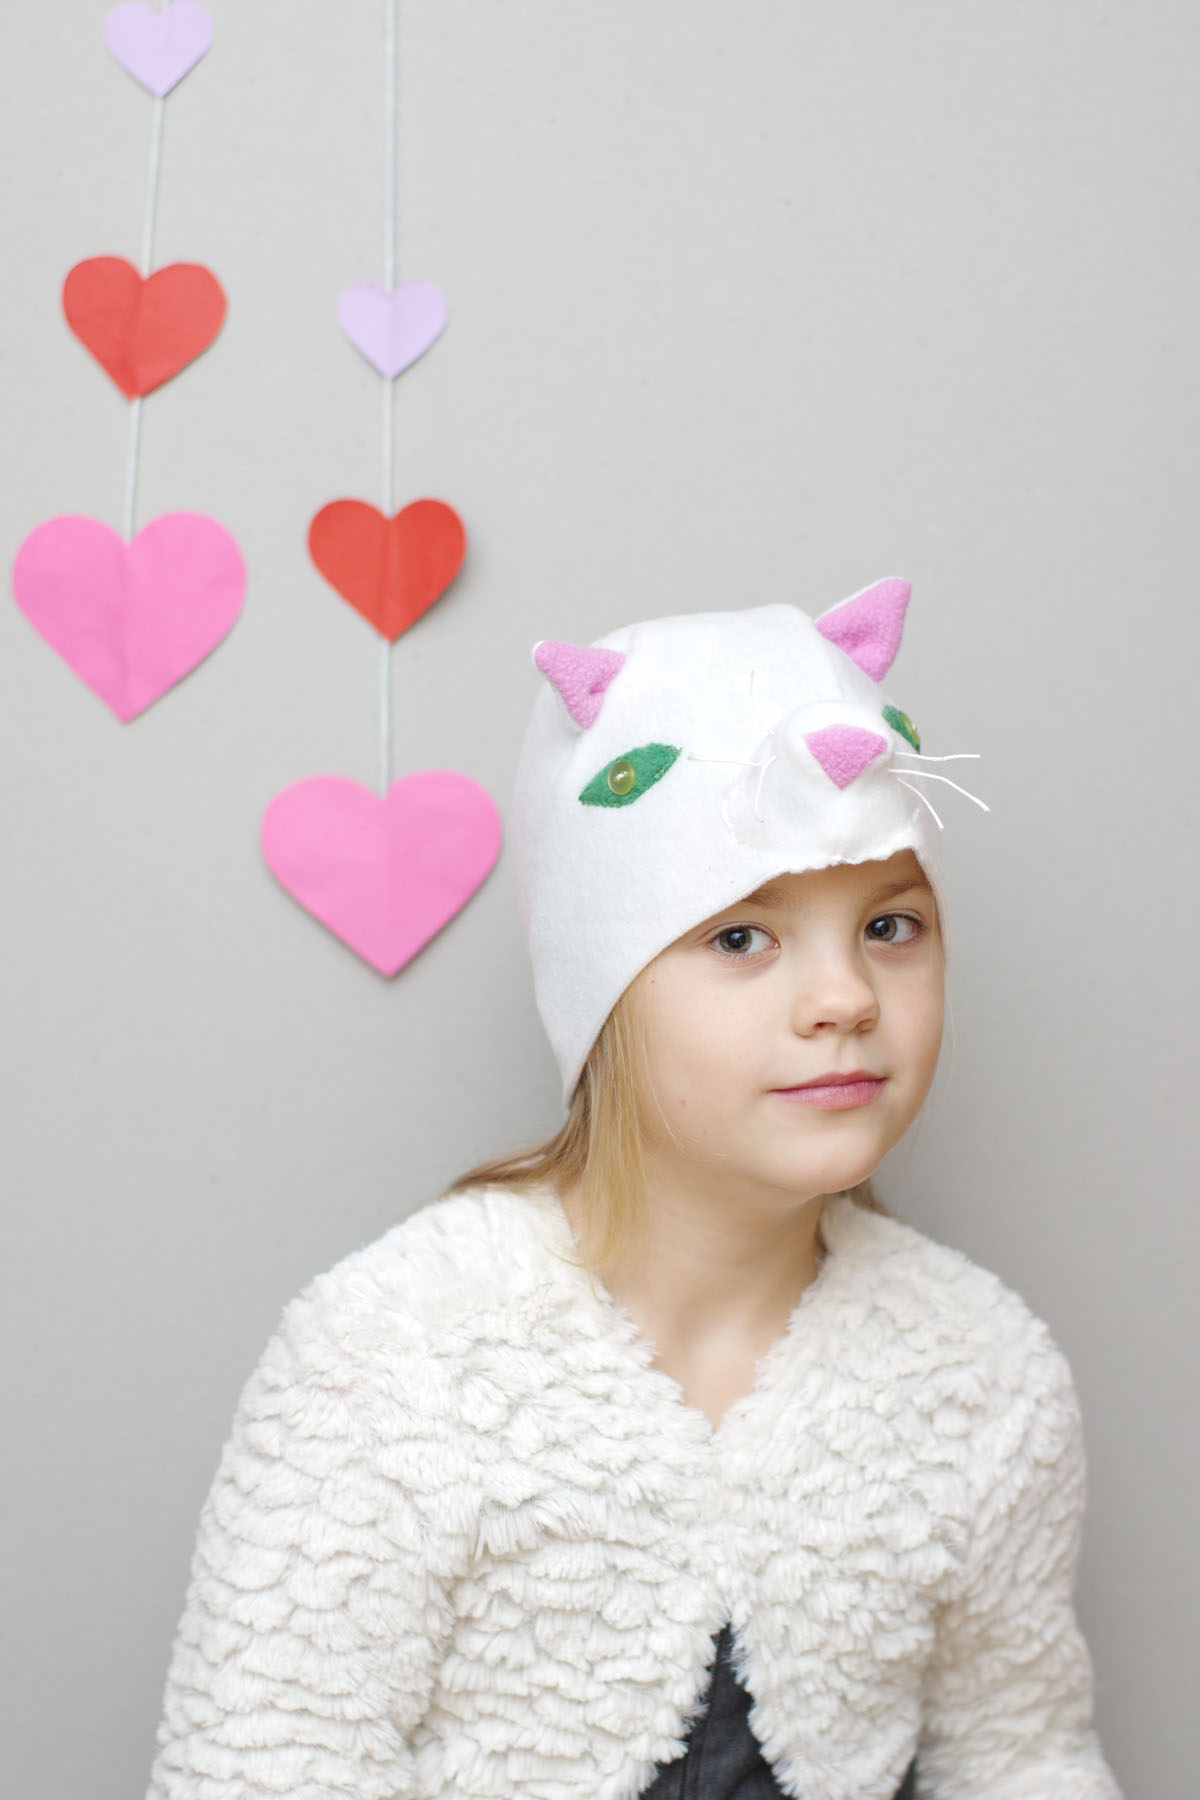 whitecat4